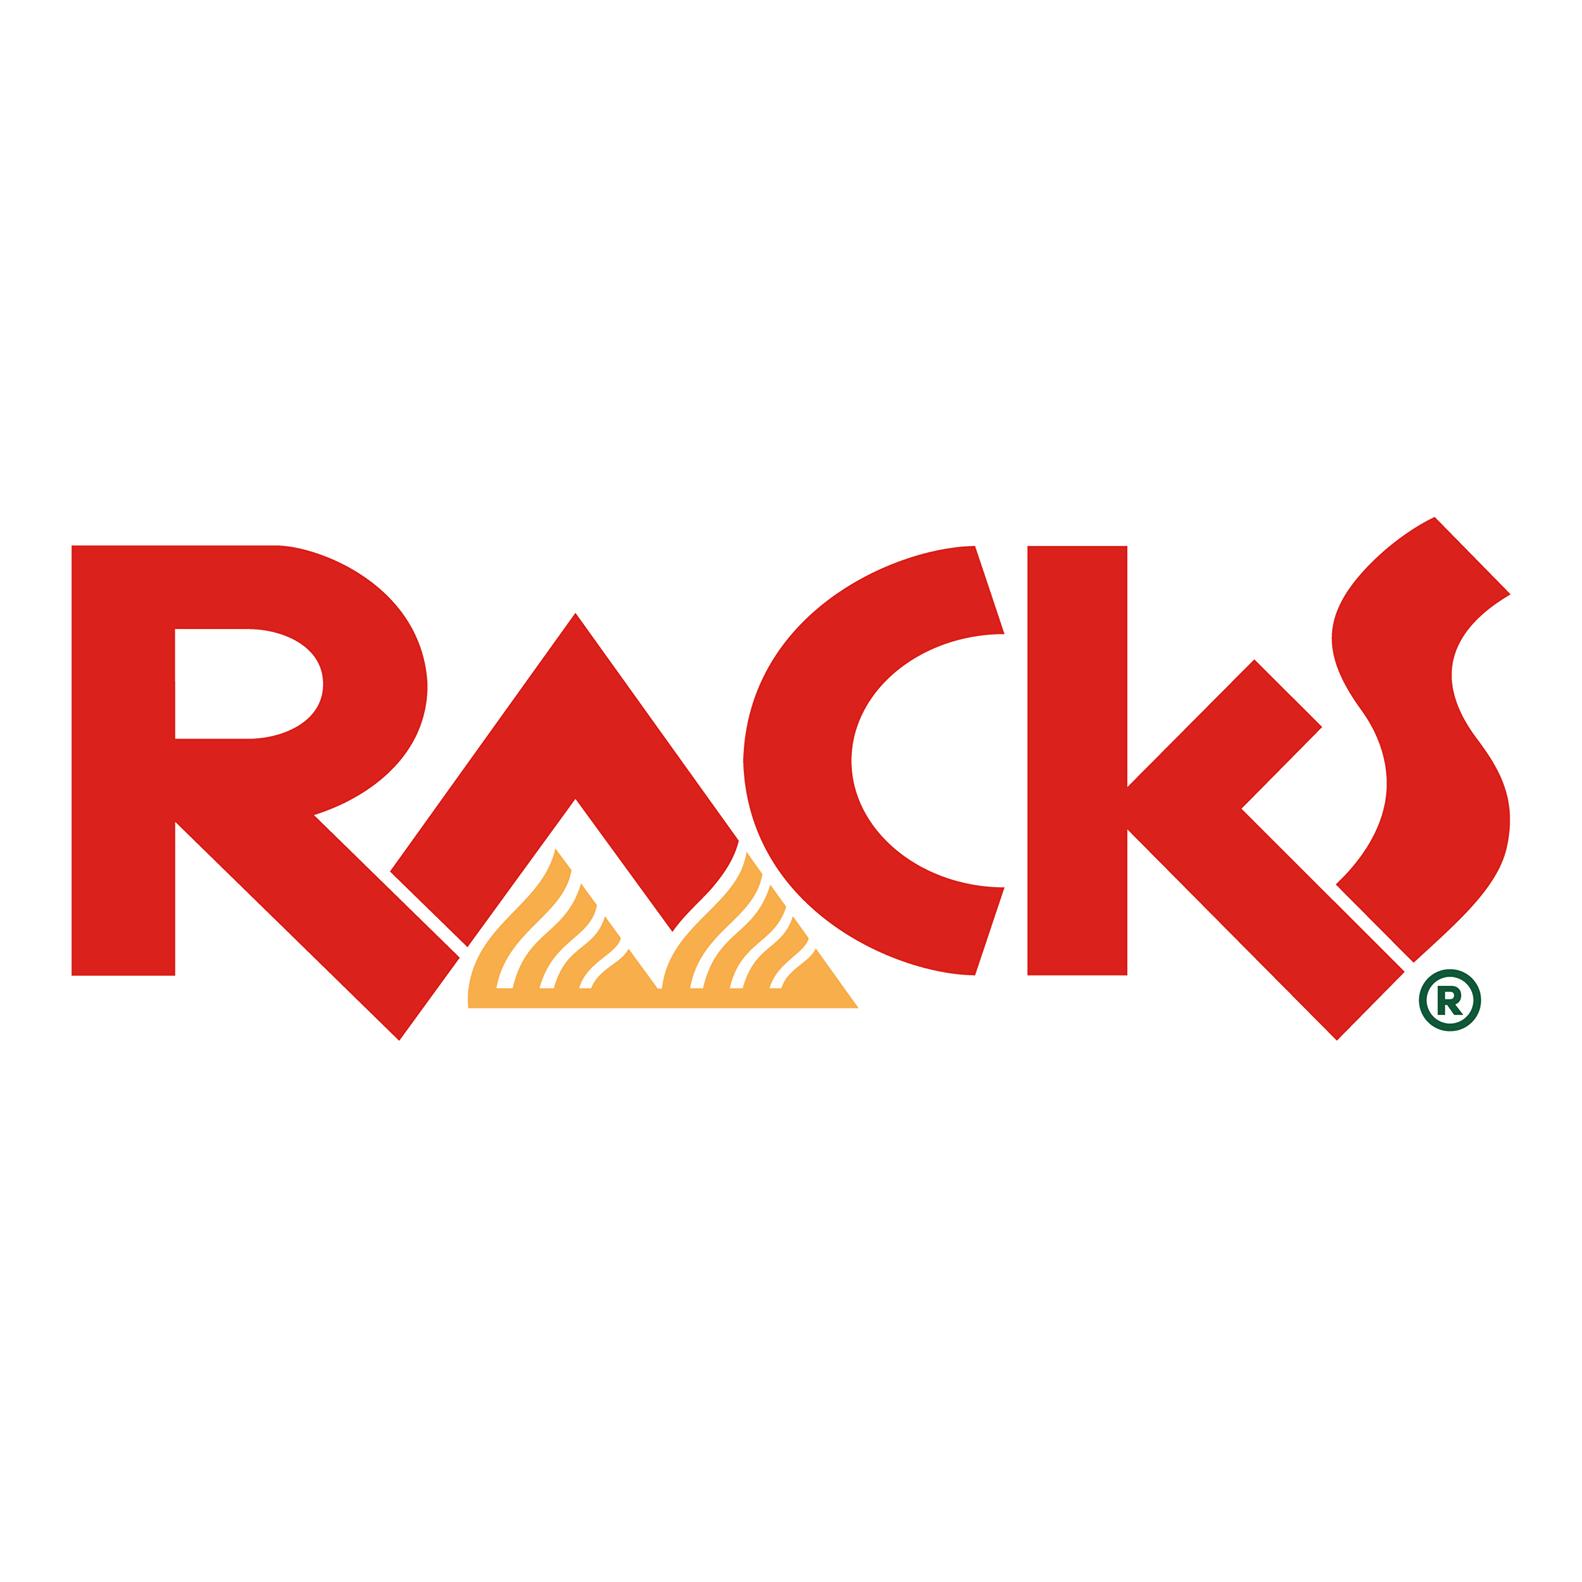 RACKS (SM North Edsa Quezon City) Quezon City